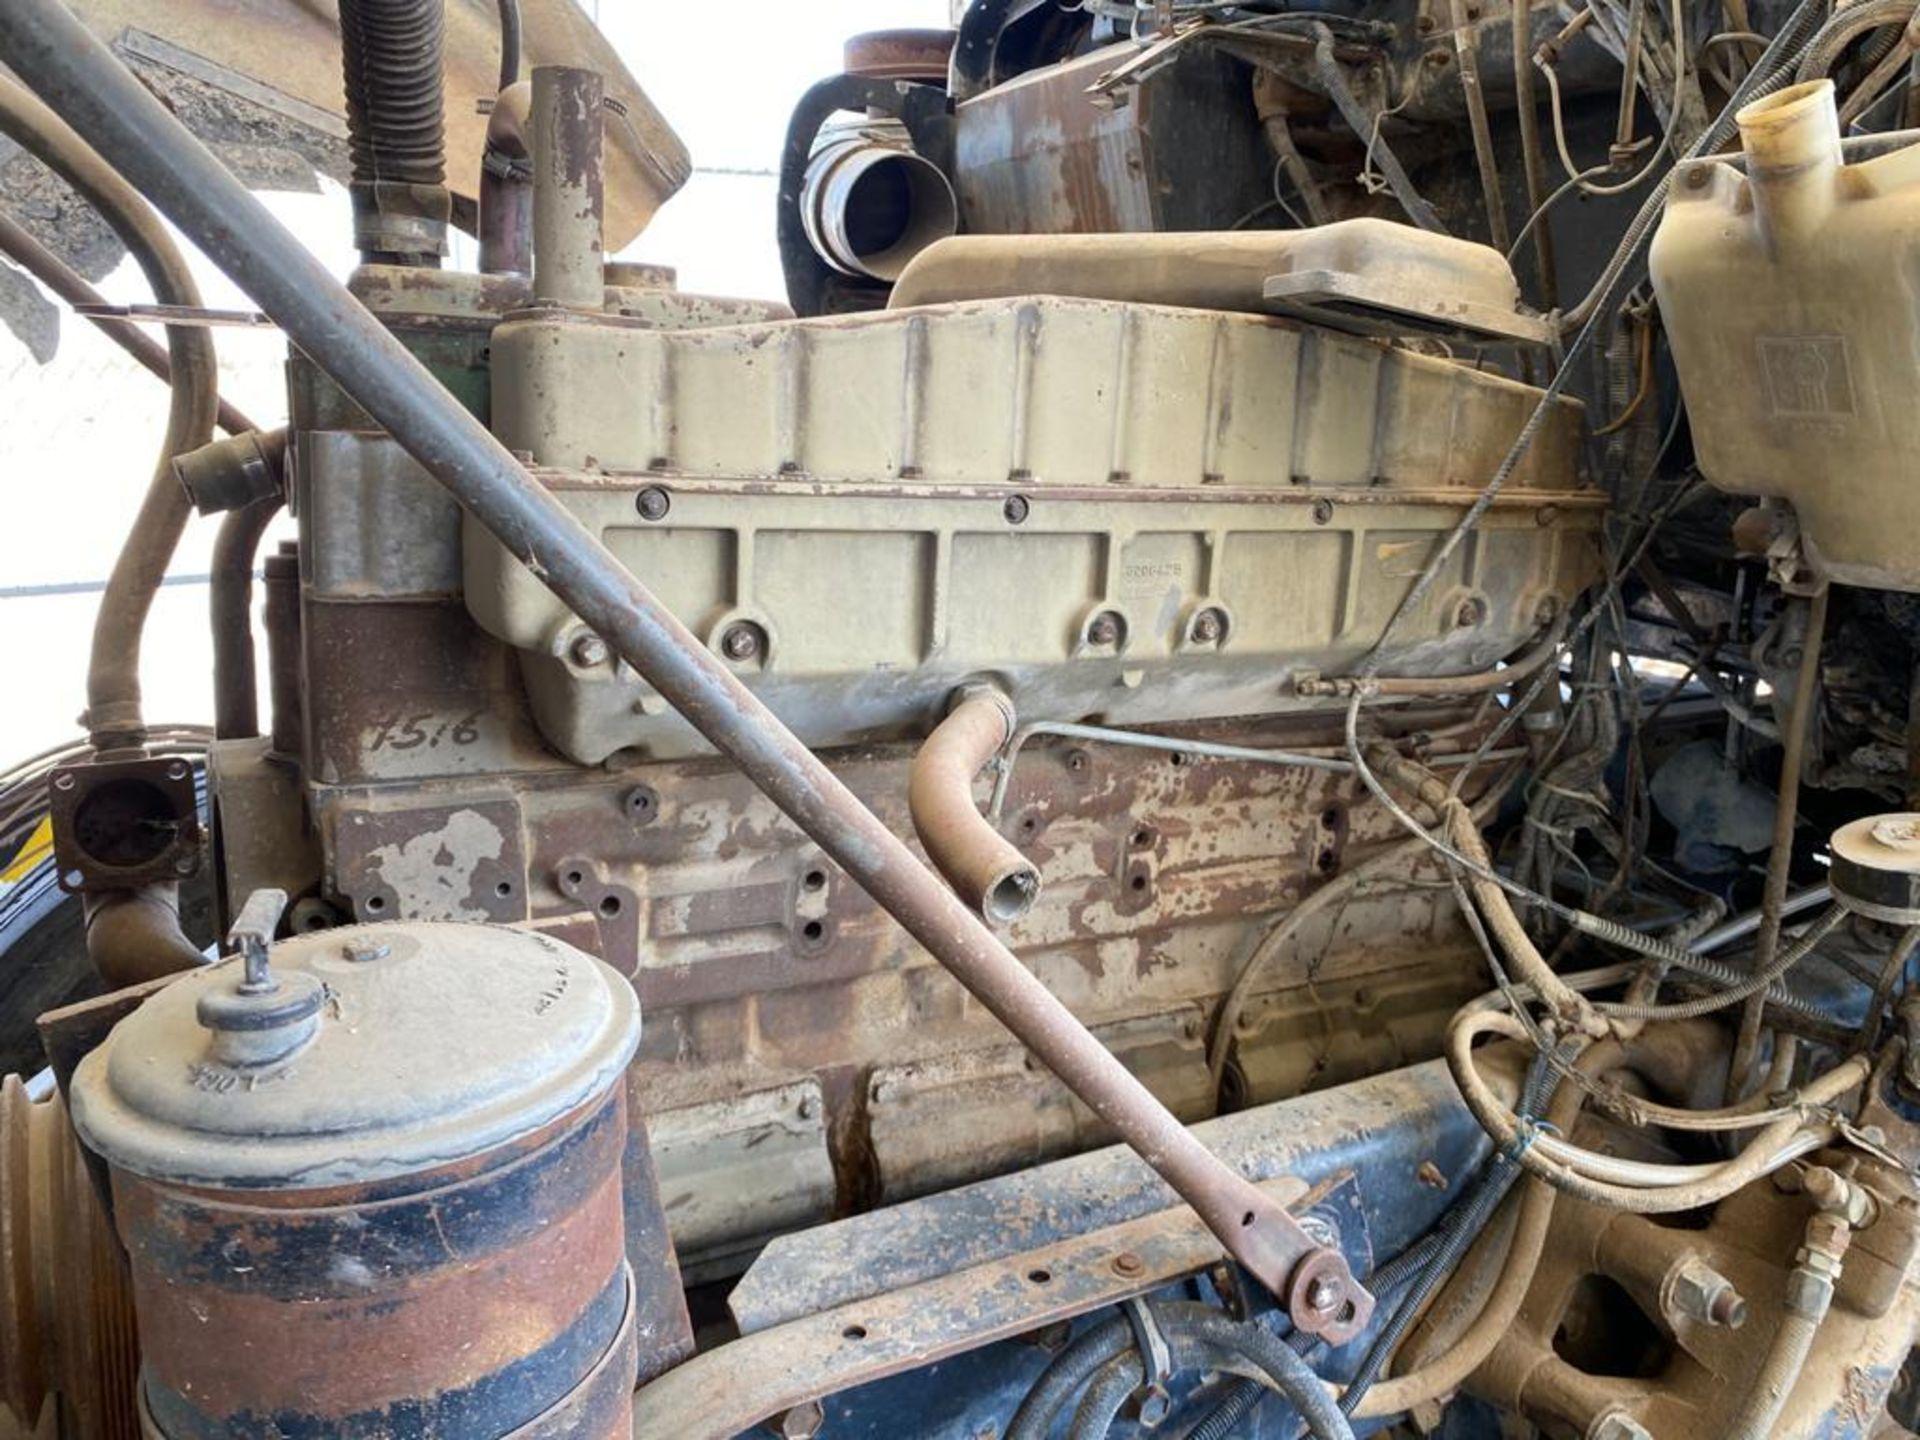 1983 Kenworth Dump Truck, standard transmission of 10 speeds, with Cummins motor - Image 45 of 68